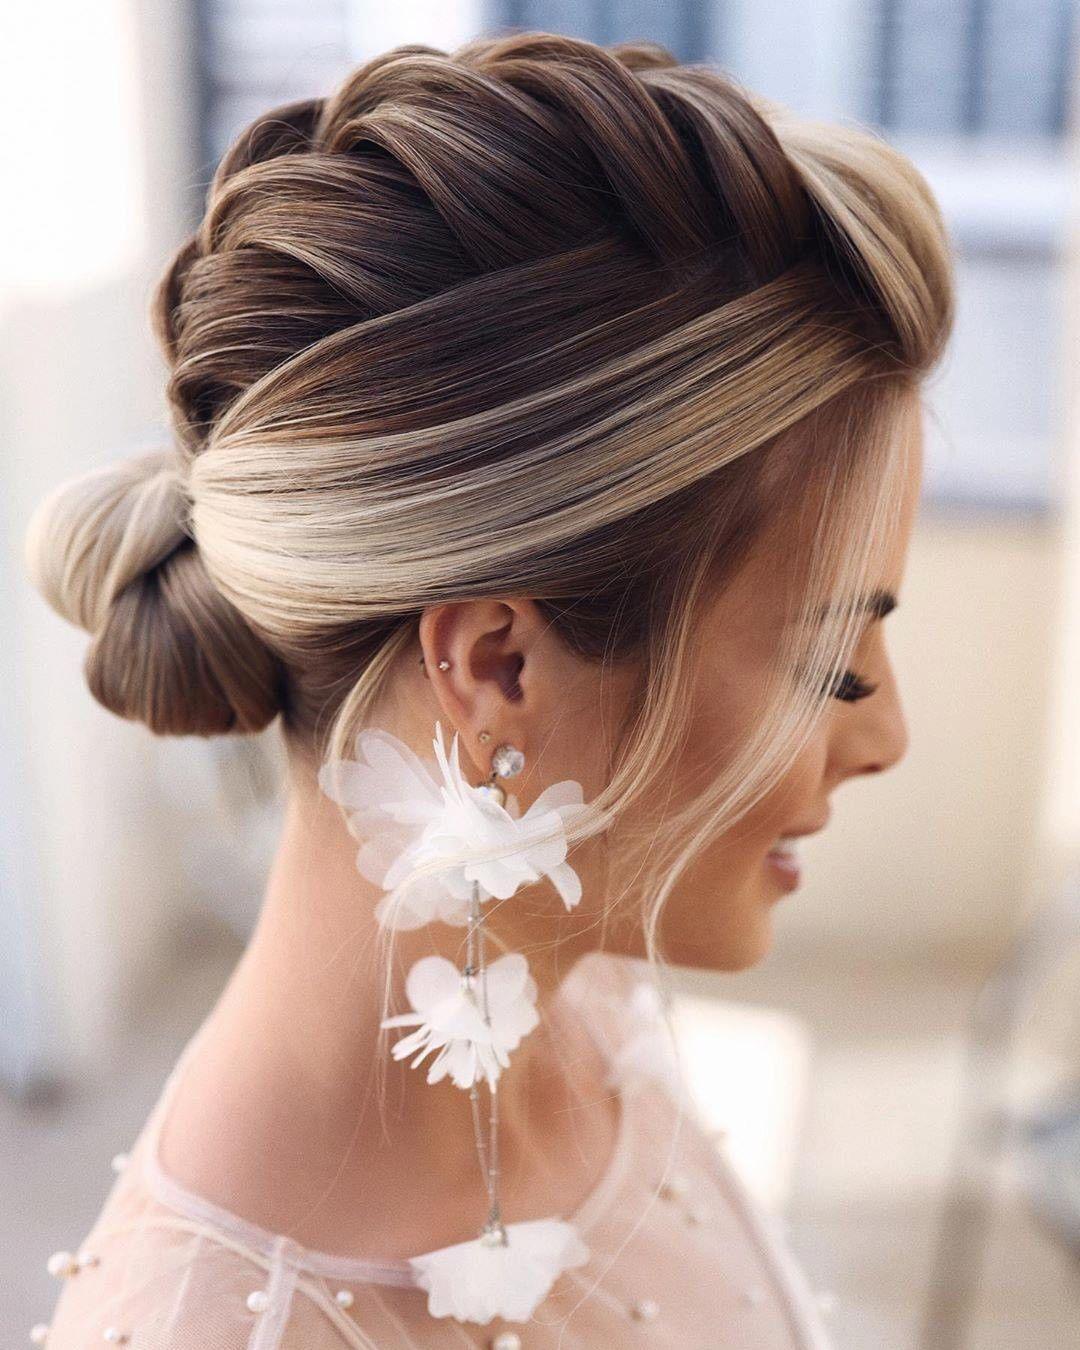 Login Lindos Peinados De Boda Login En 2020 Peinados Fiesta Pelo Corto Peinados Con Pelo Recogido Peinados De Fiesta Trenza